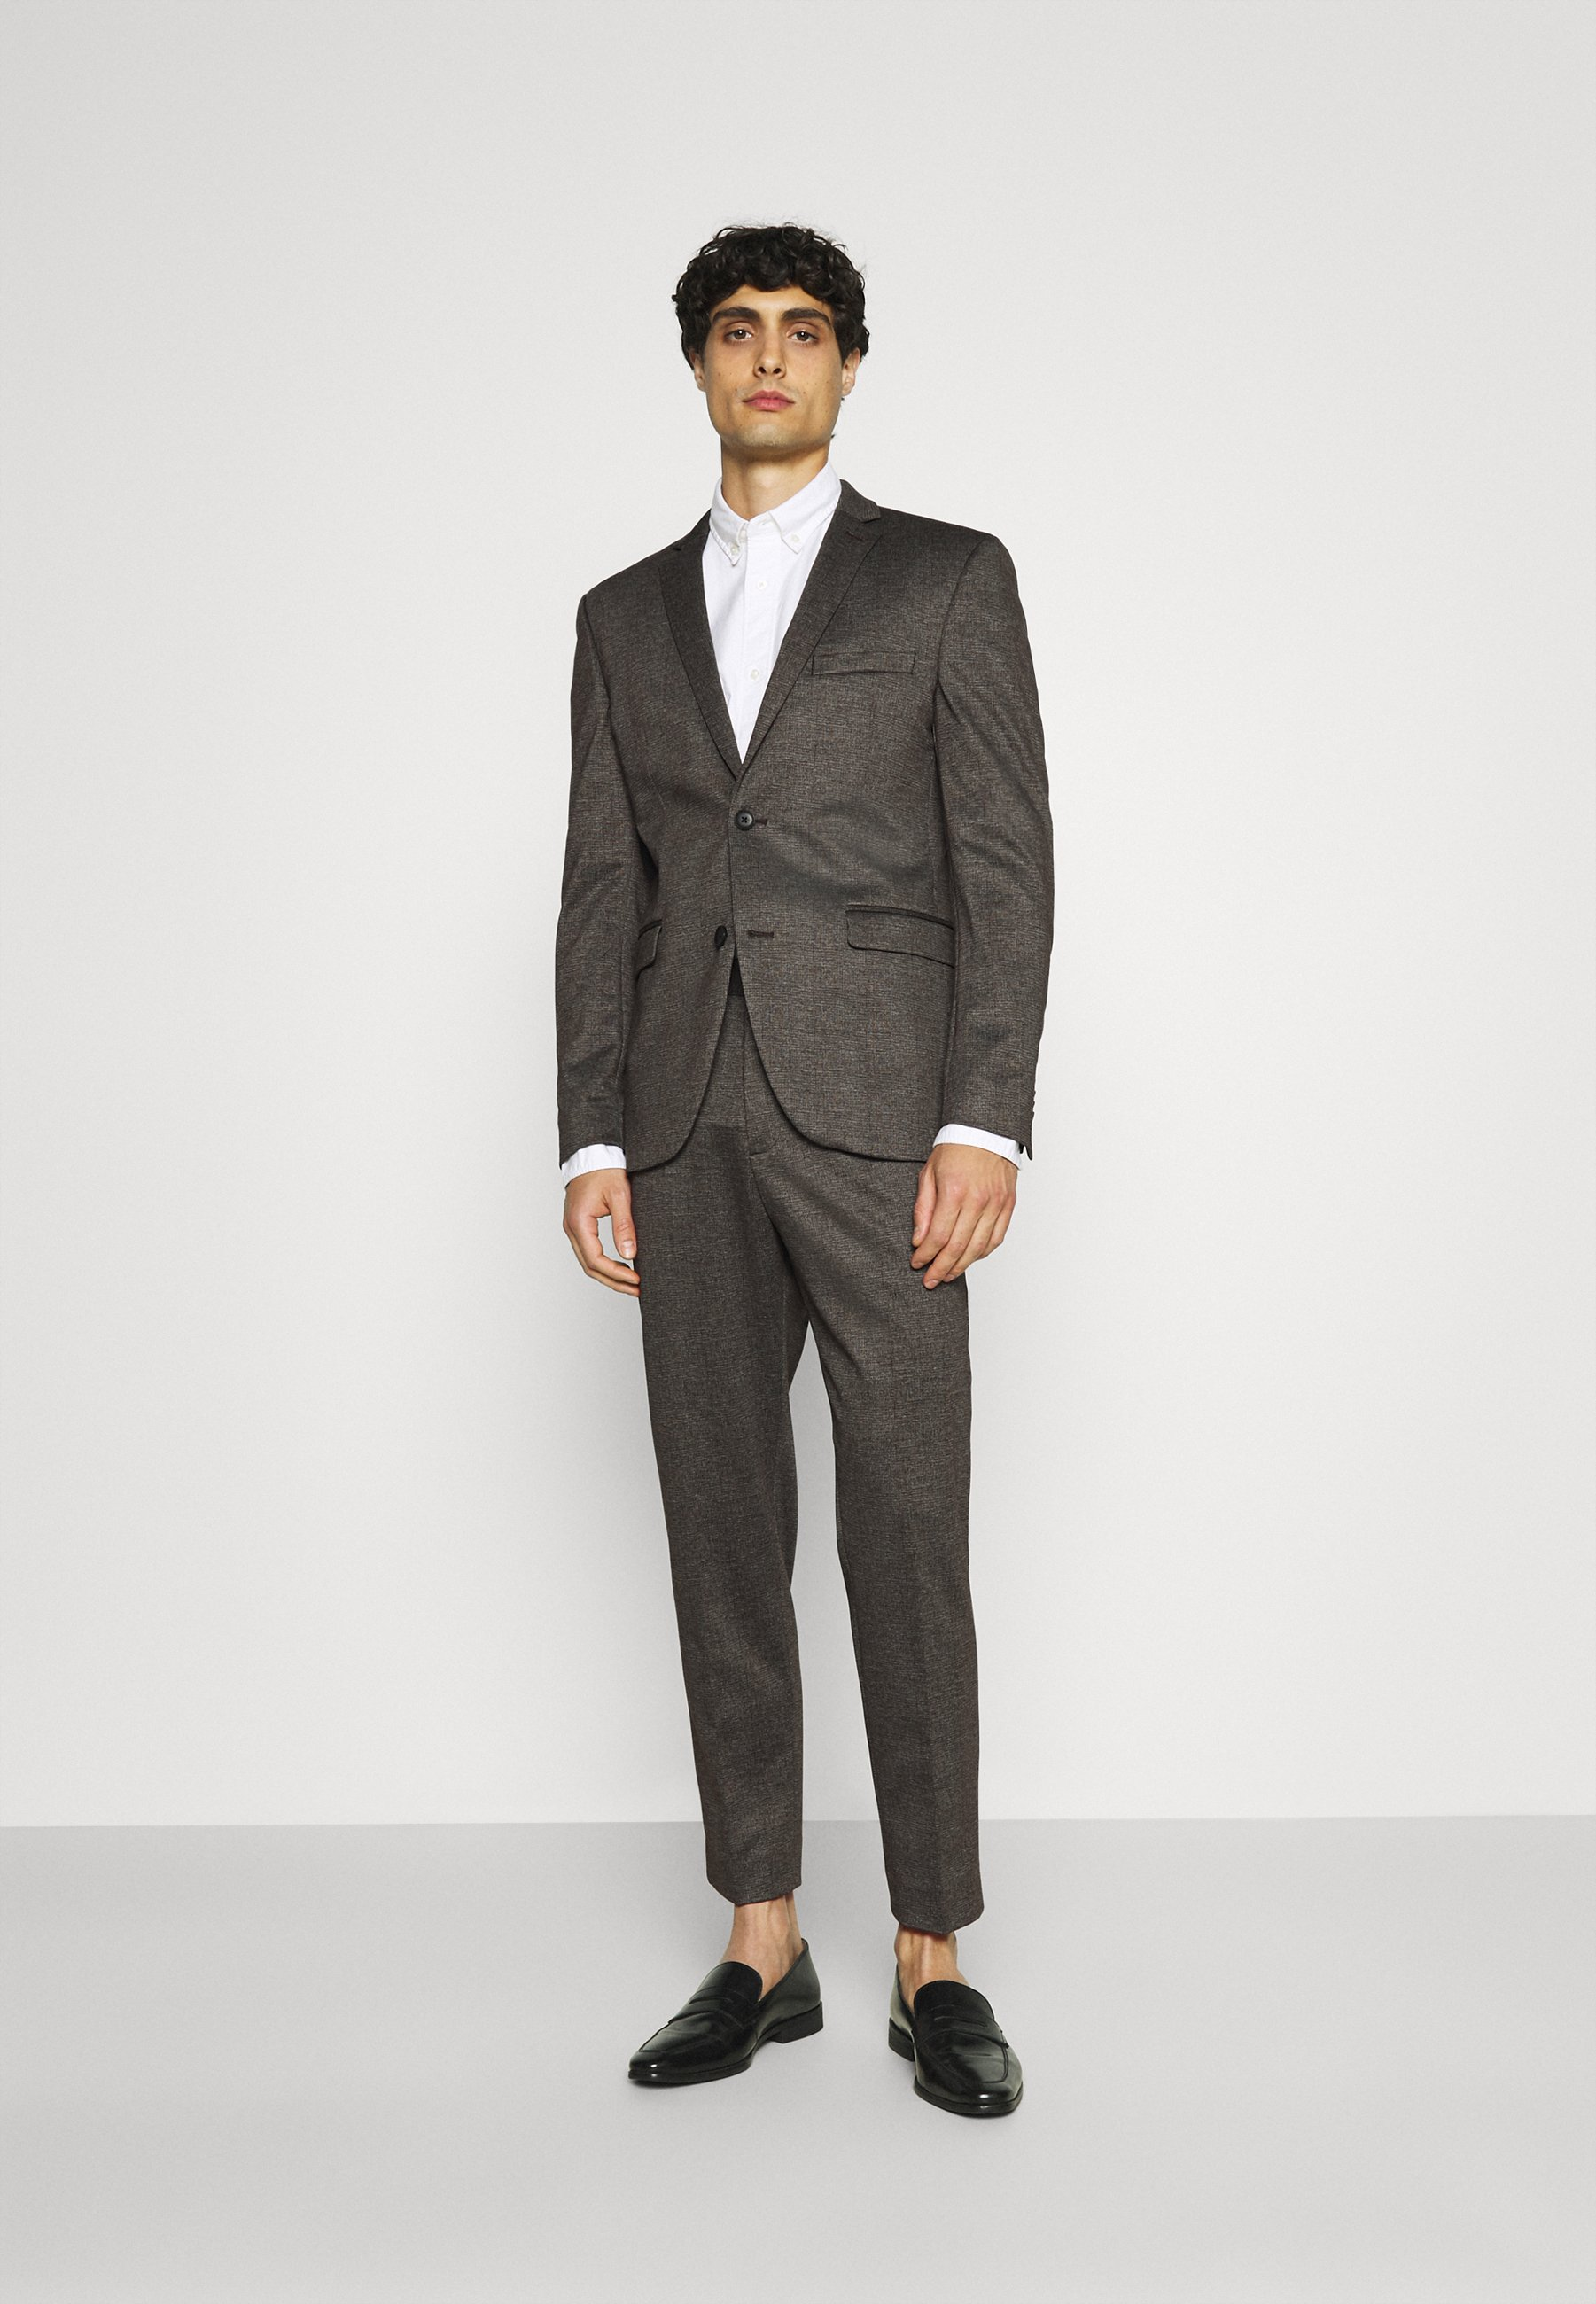 Homme COMFORTCHECK - Costume - dark brown